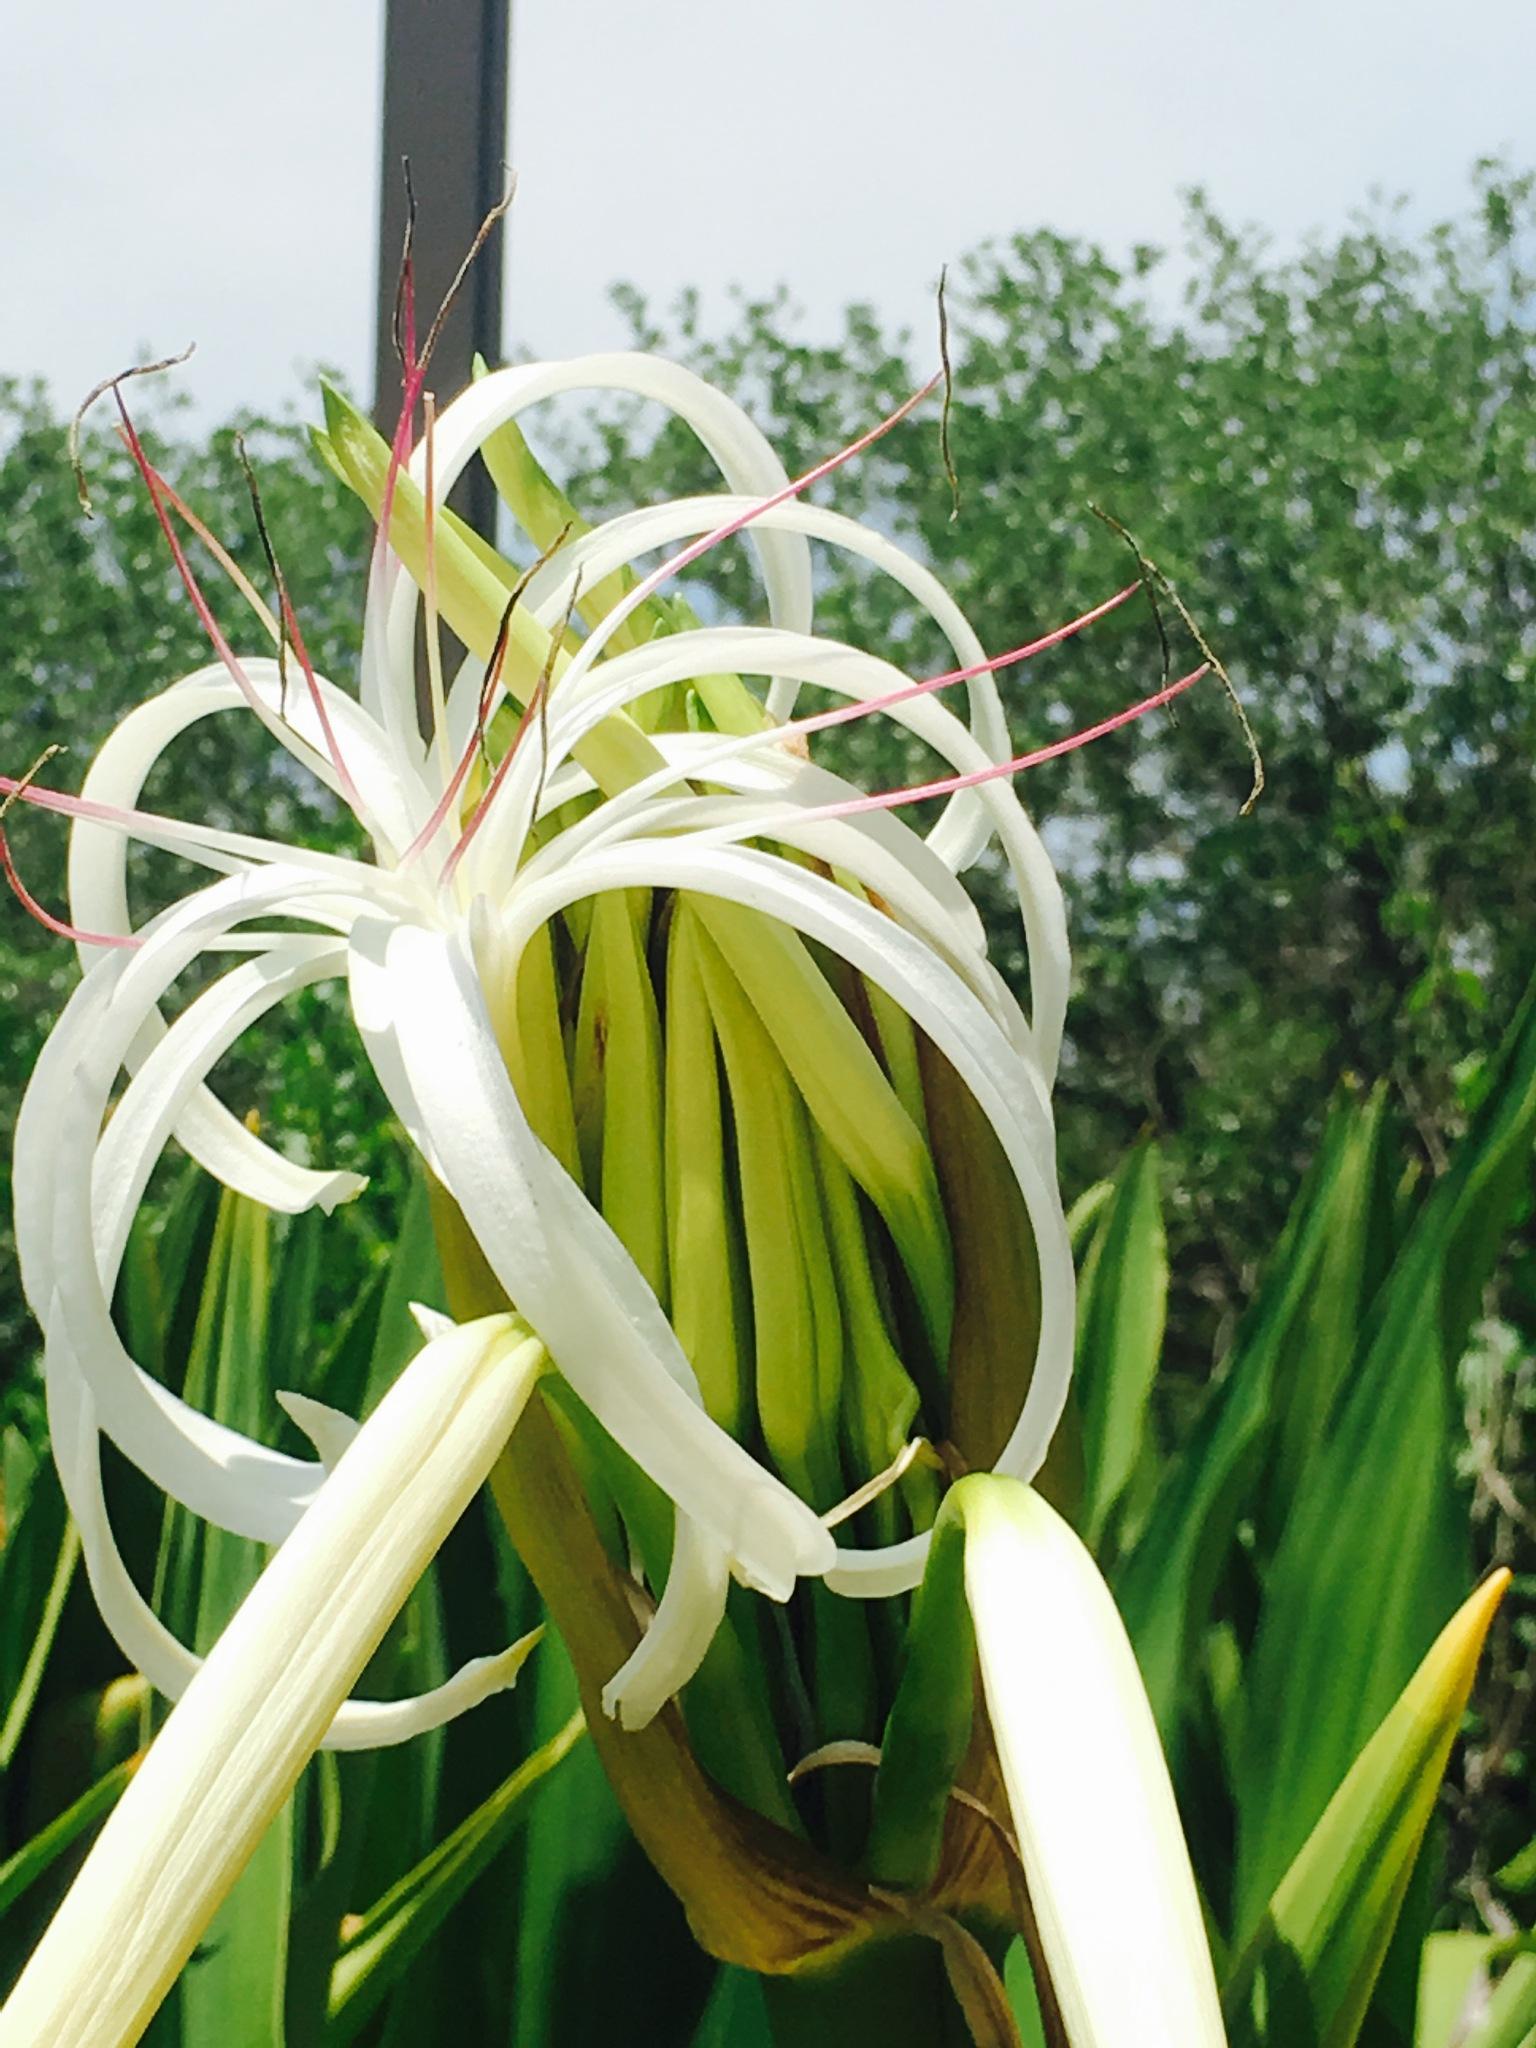 Lilies 2 by pamela.kanarr